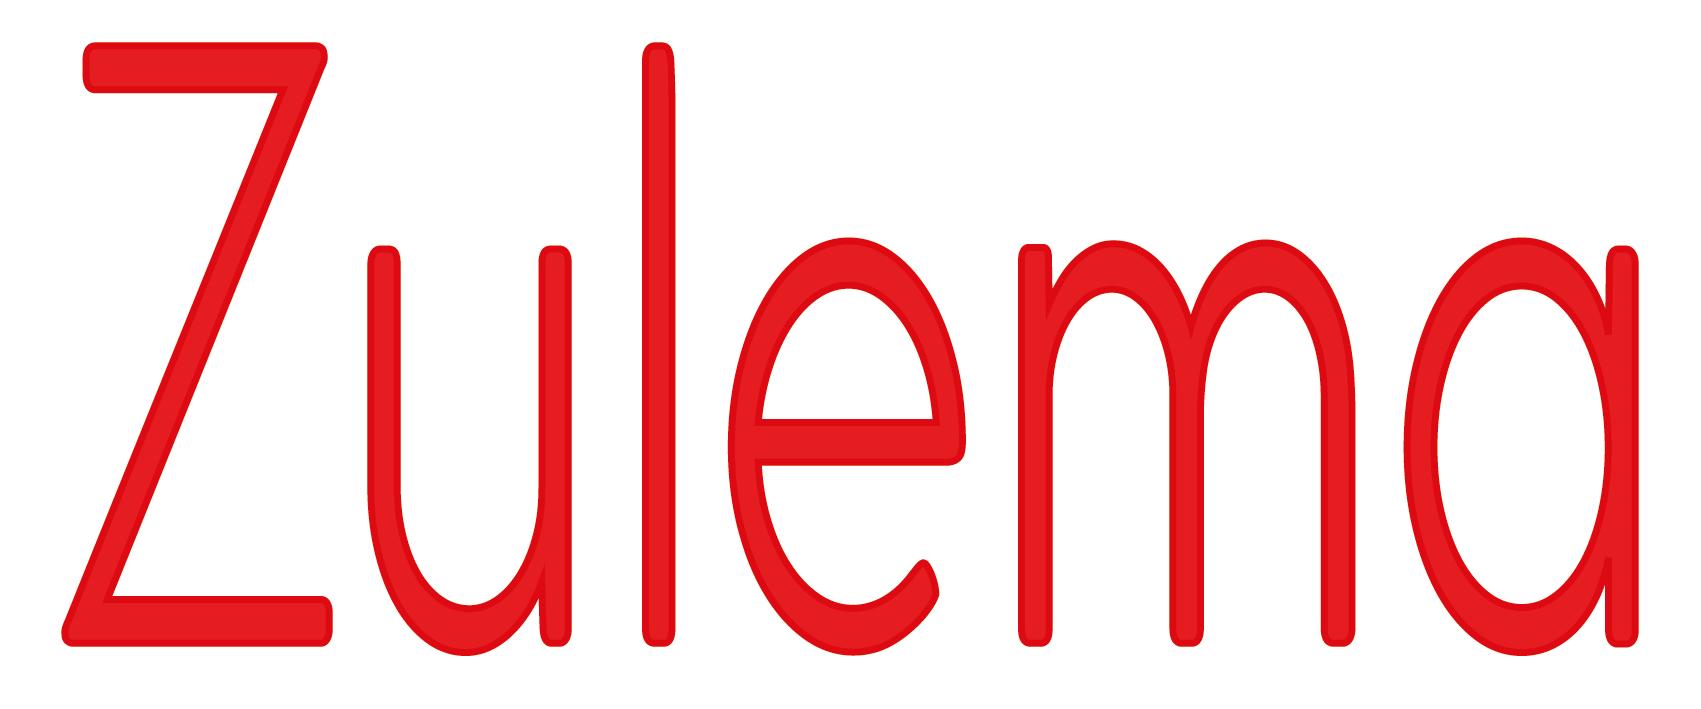 significado de zulema